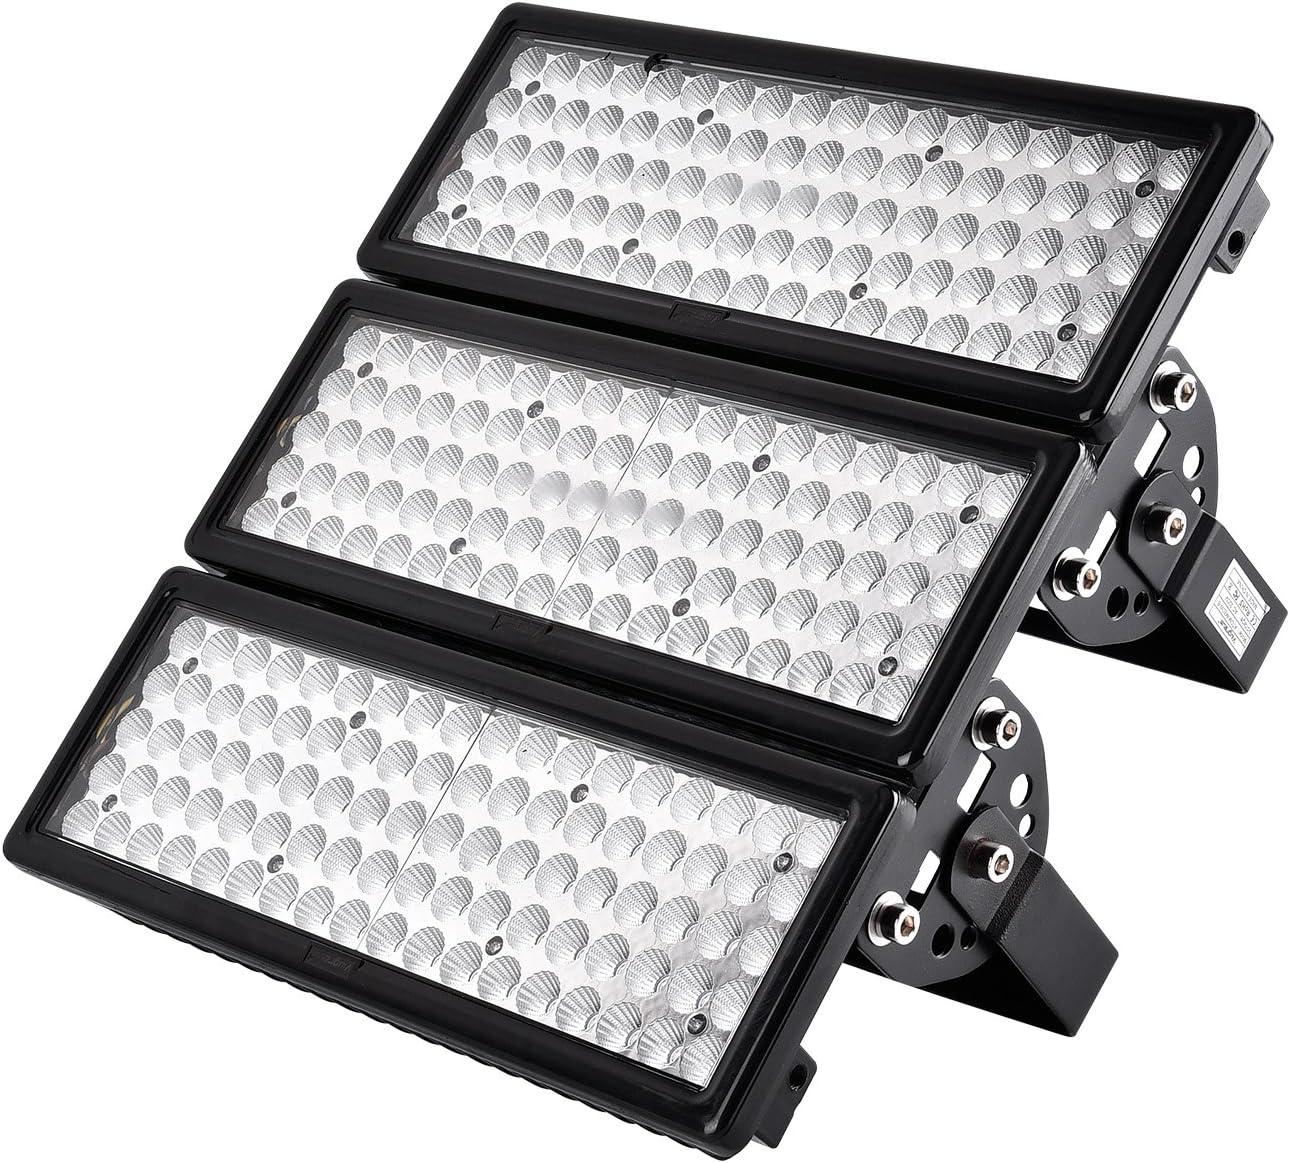 LED Sale SALE% OFF quality assurance 300W Concentrating Module Flood Light White 110V Warm